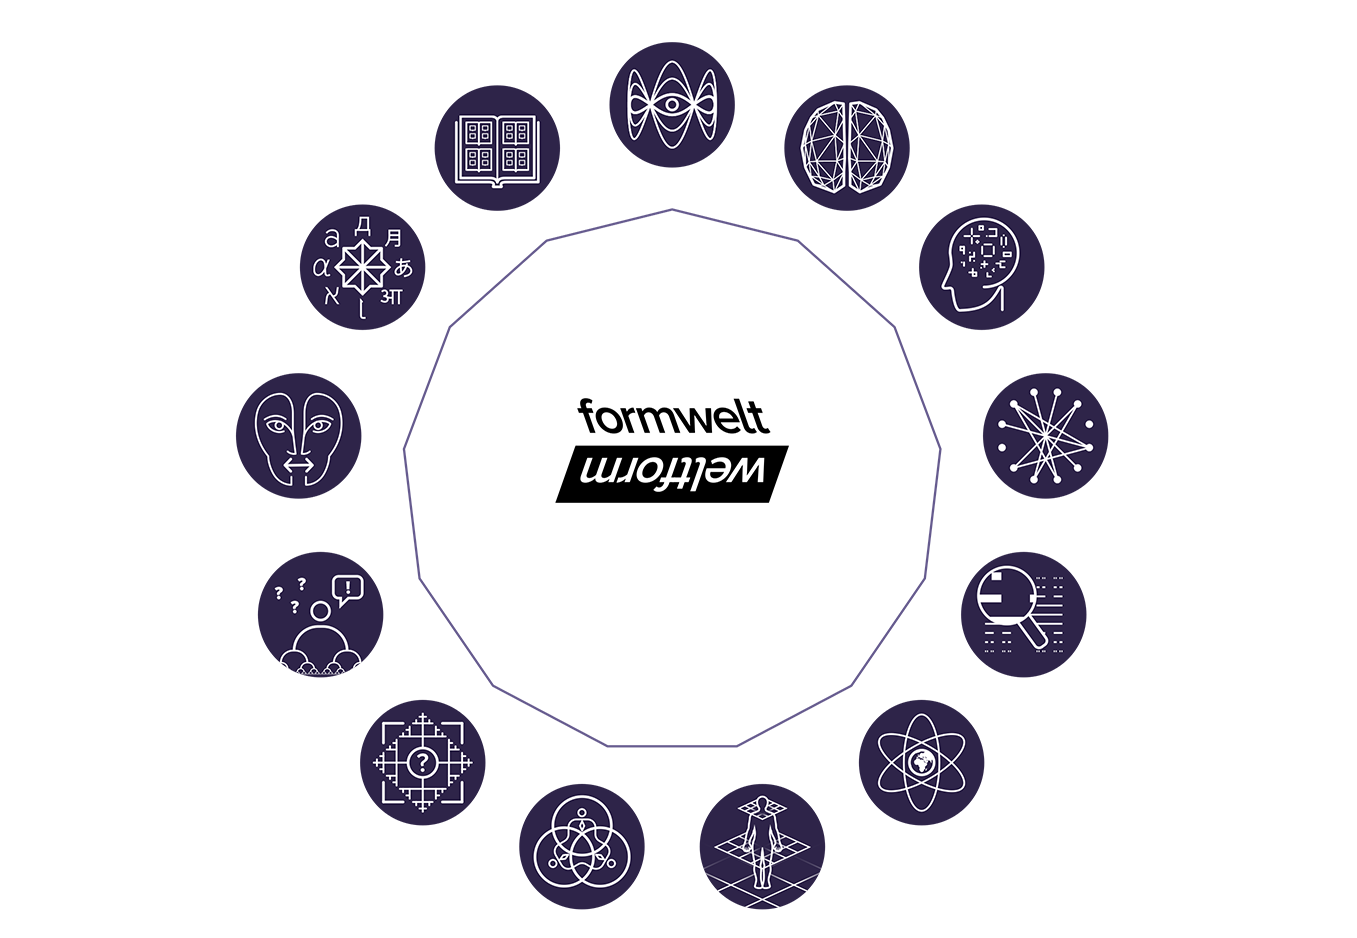 FORMWELT applications